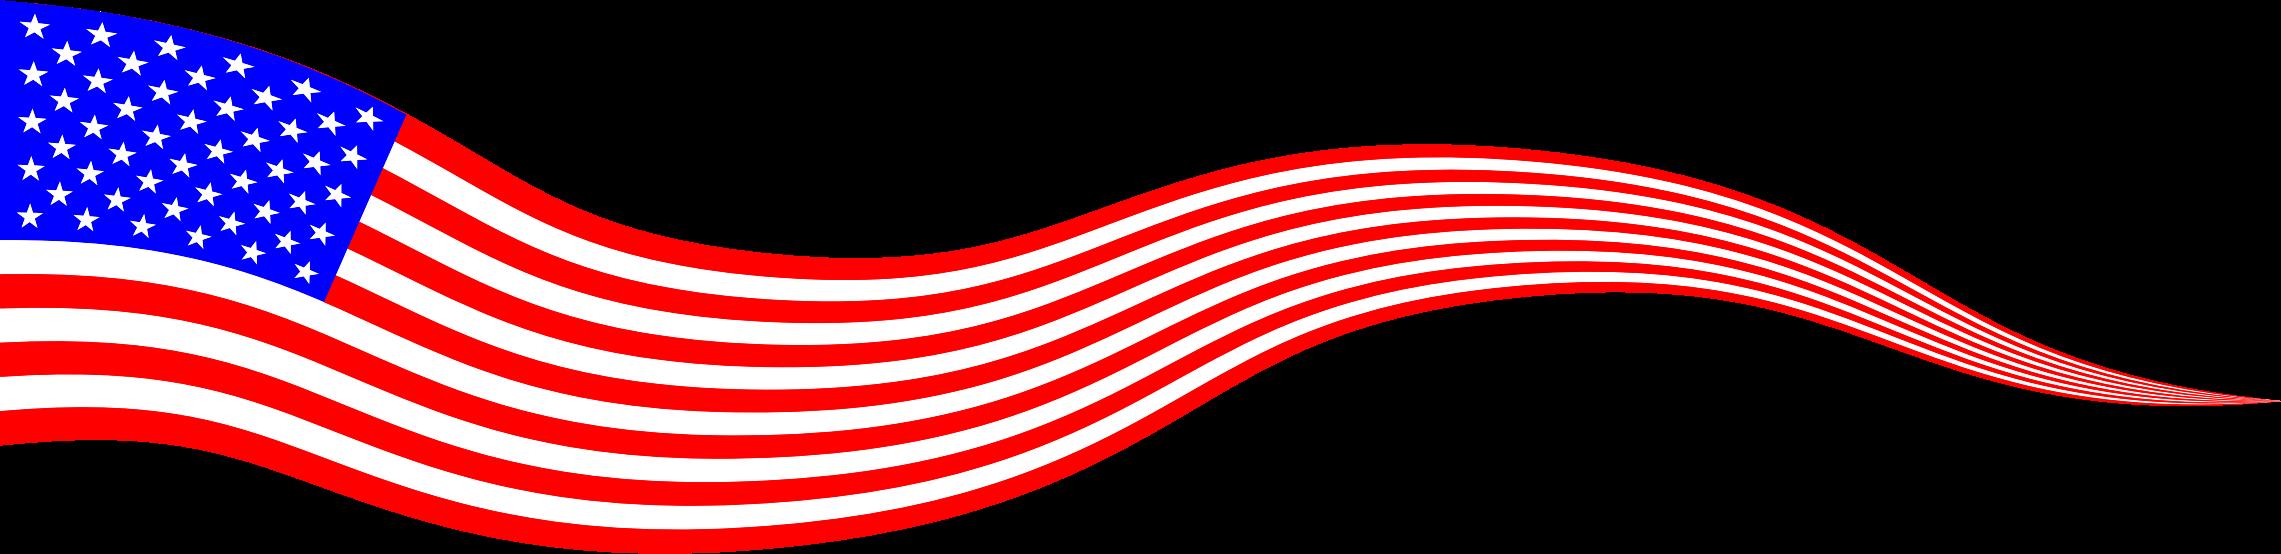 Free America Banner Cliparts, Download Free Clip Art, Free Clip Art.